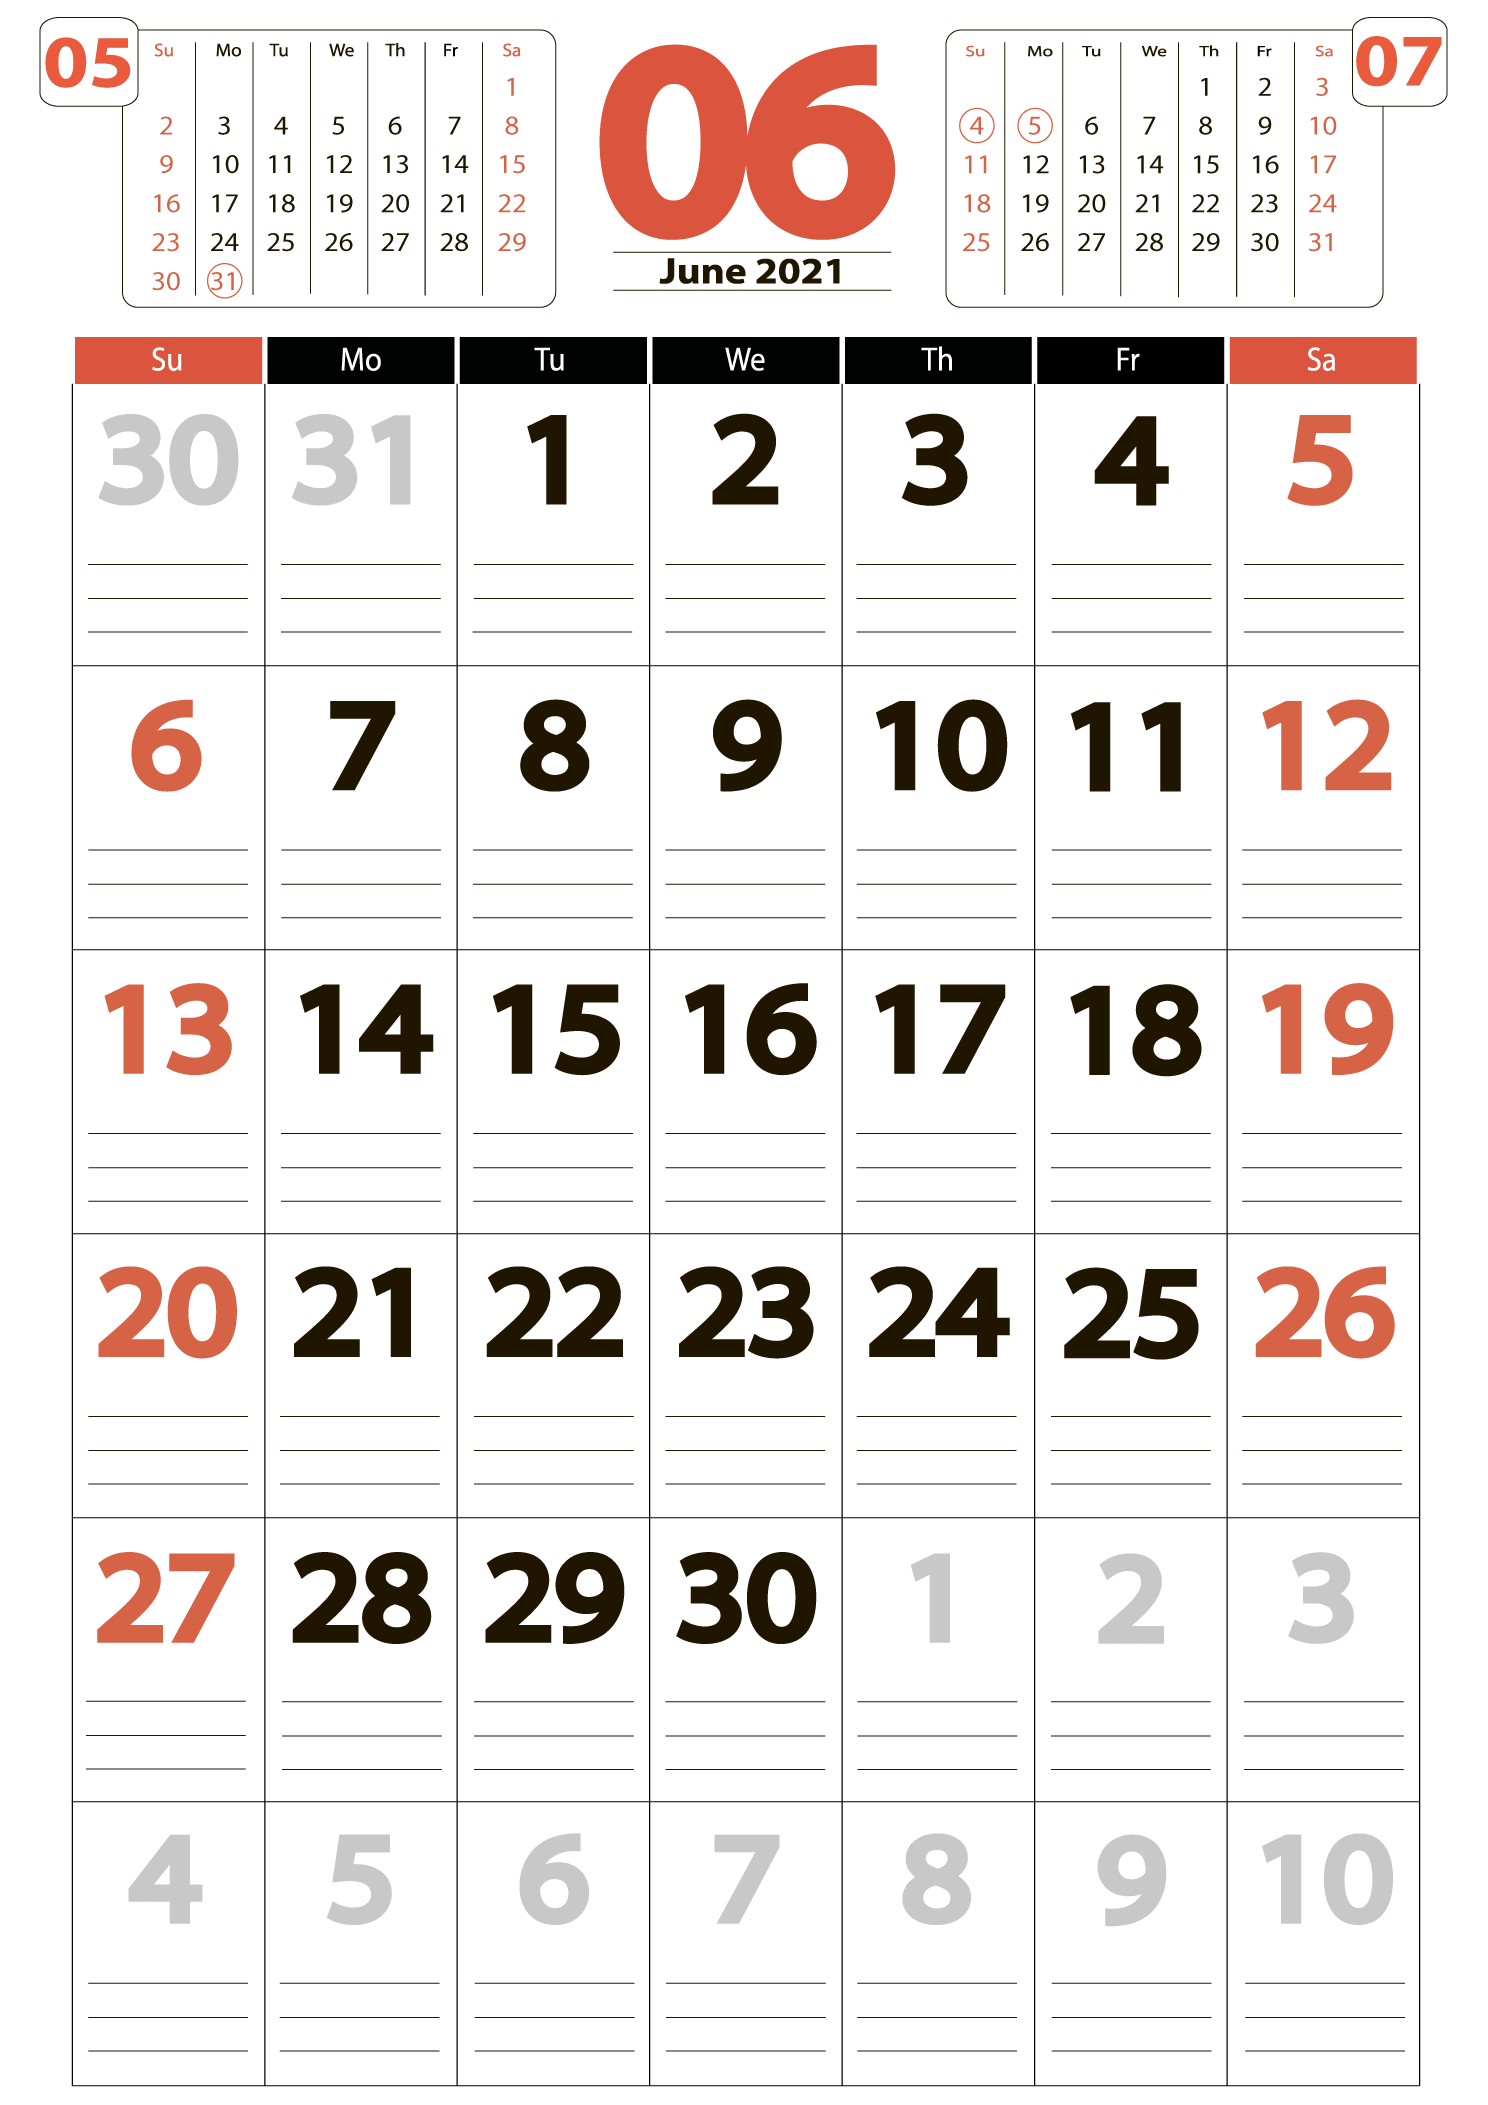 June 2021 calendar portrait download